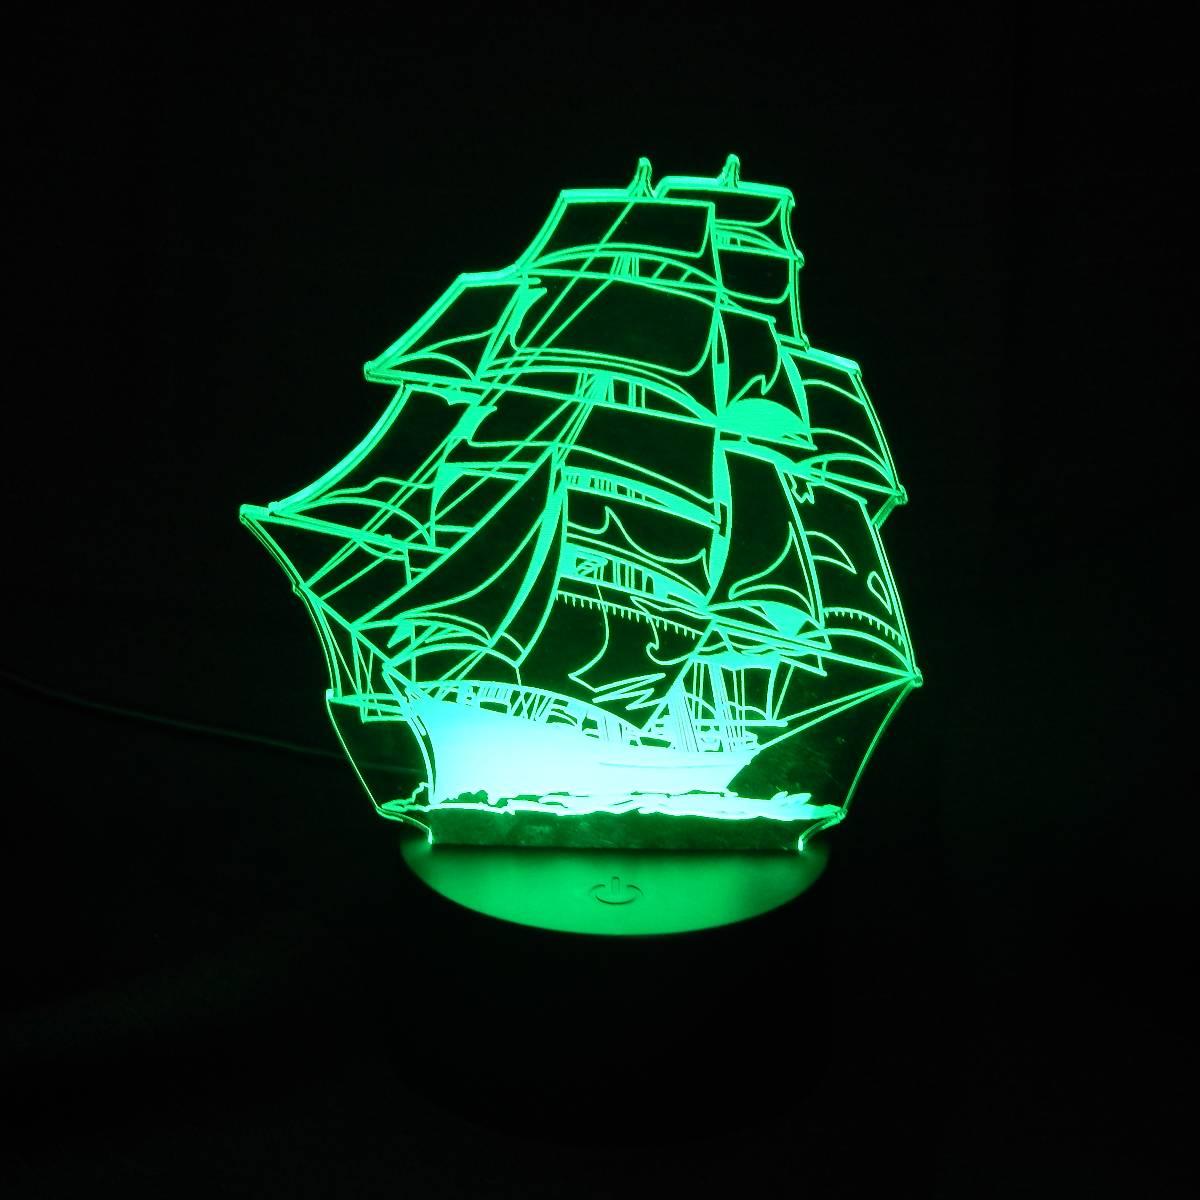 Lampu Meja Lampu Tidur Lampu Hias Kapal LED 3D Tradisional1